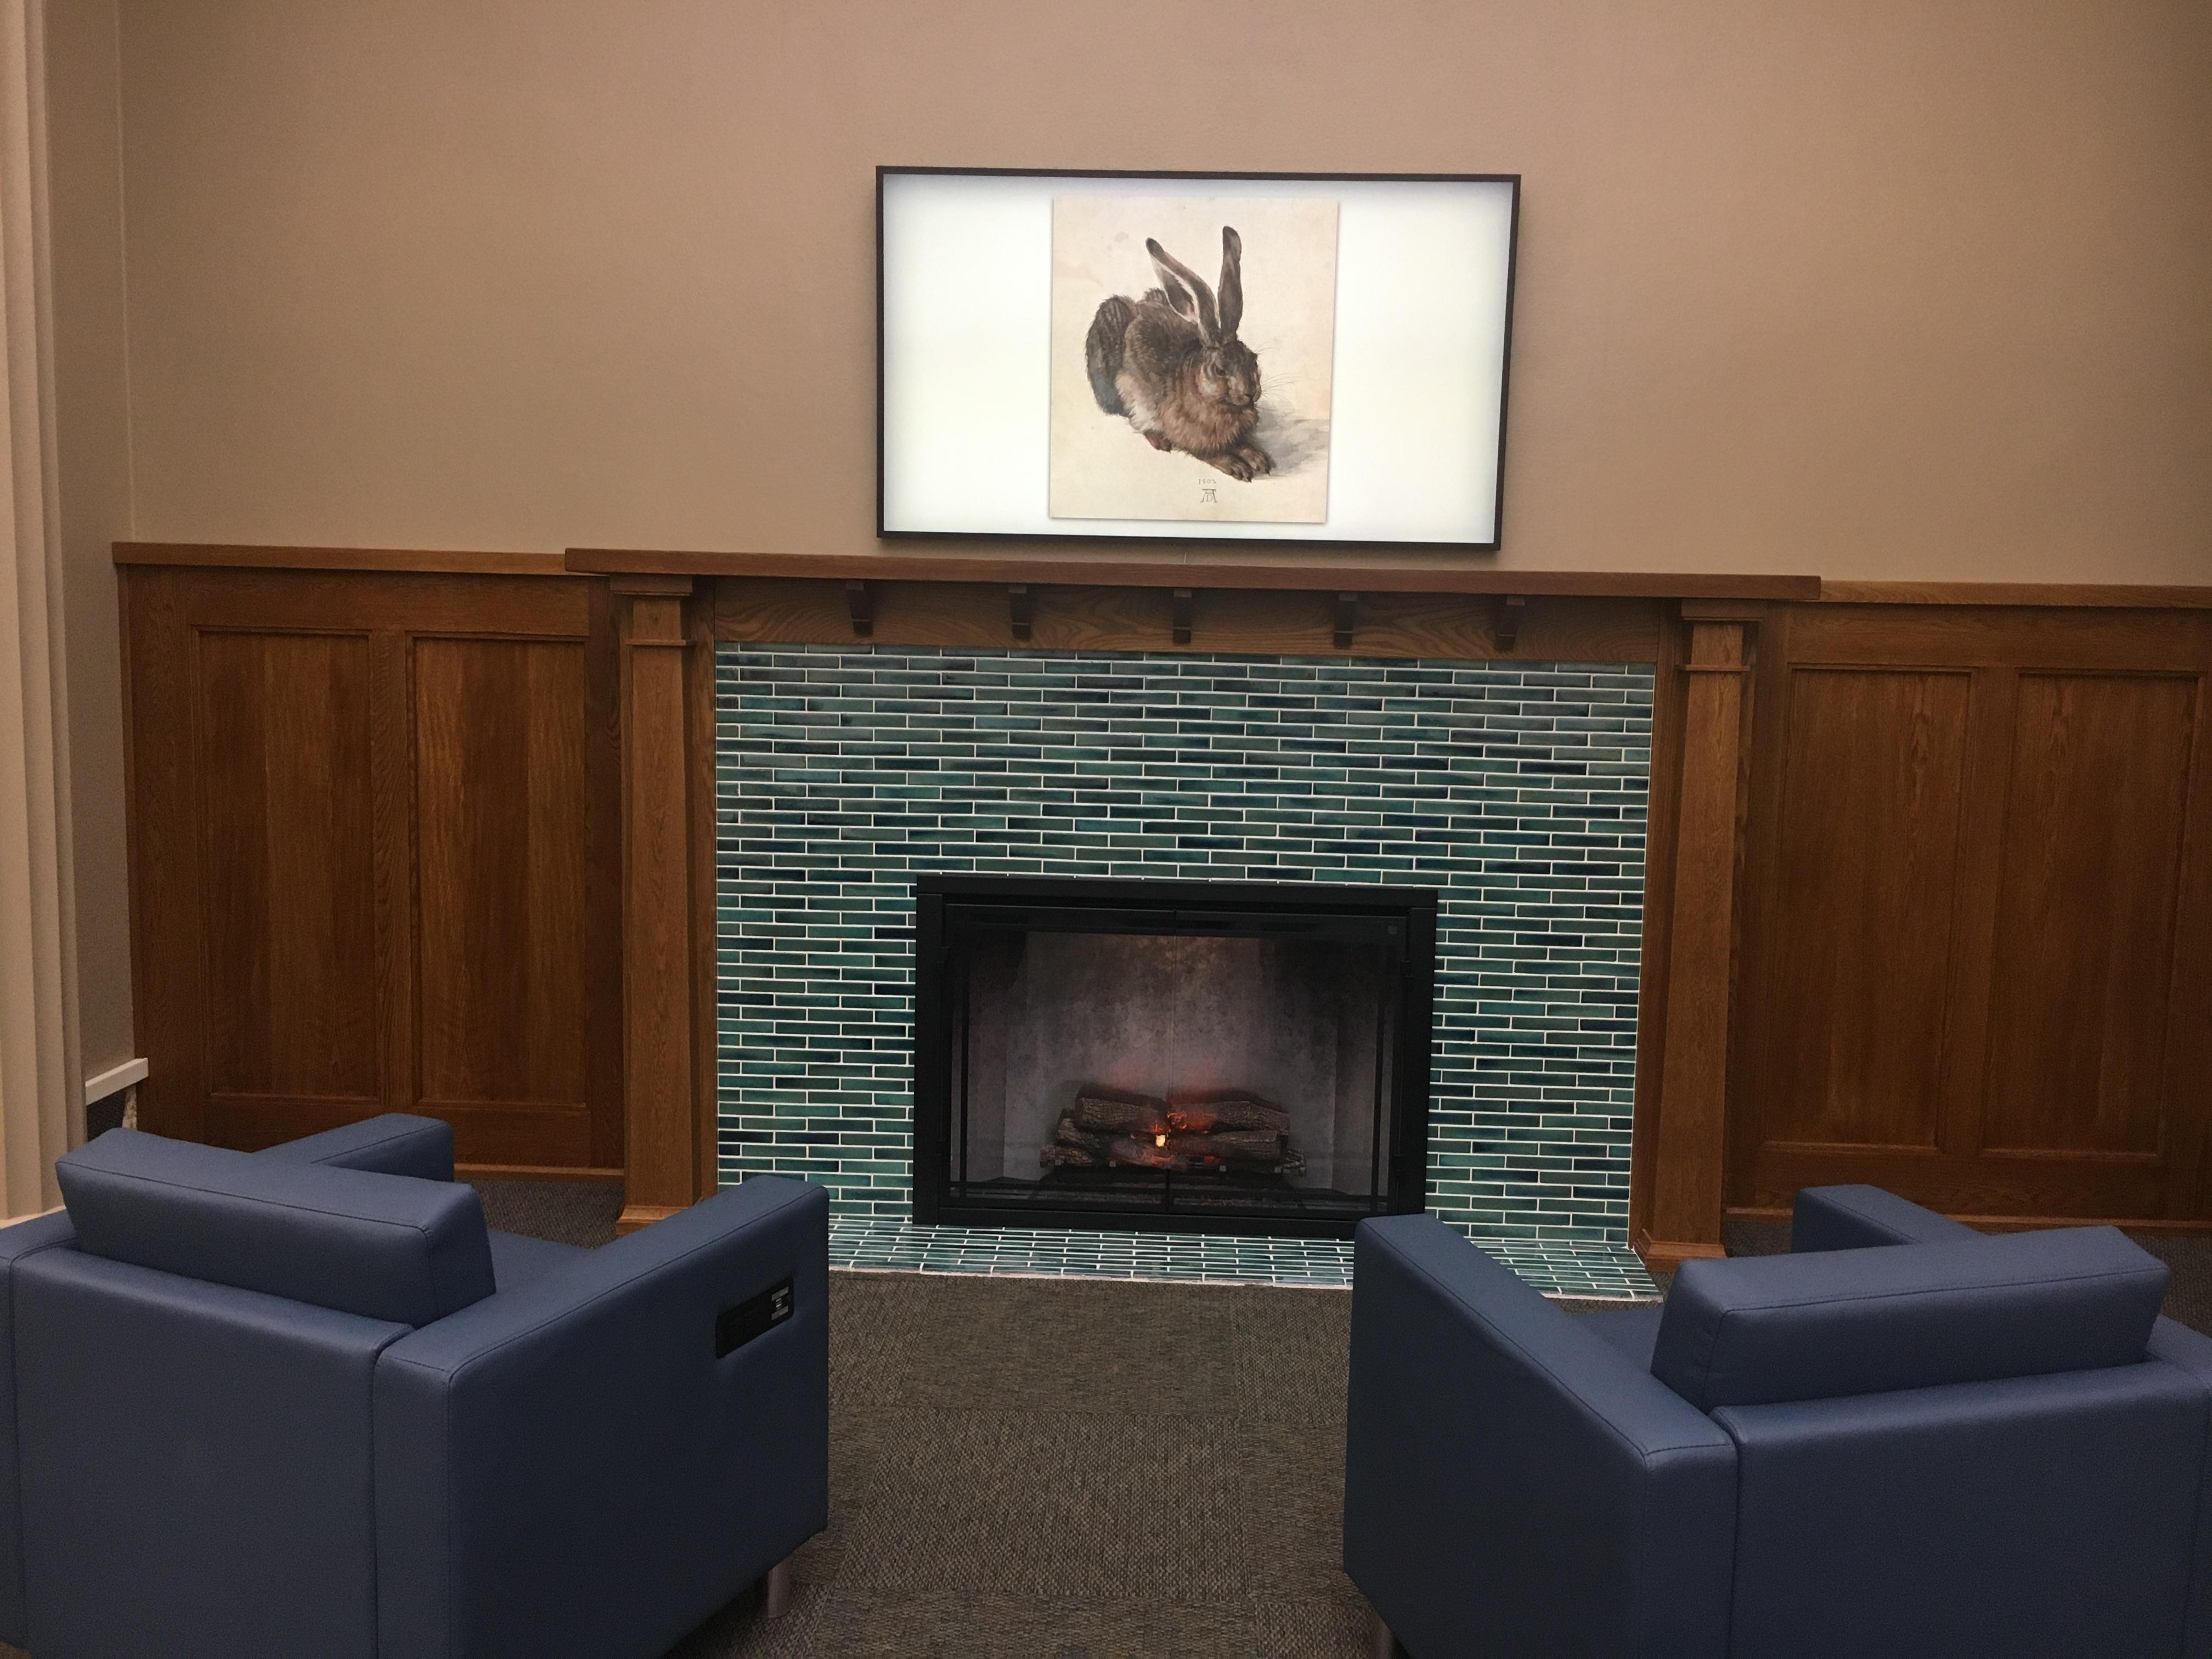 2021 Fireplace Room